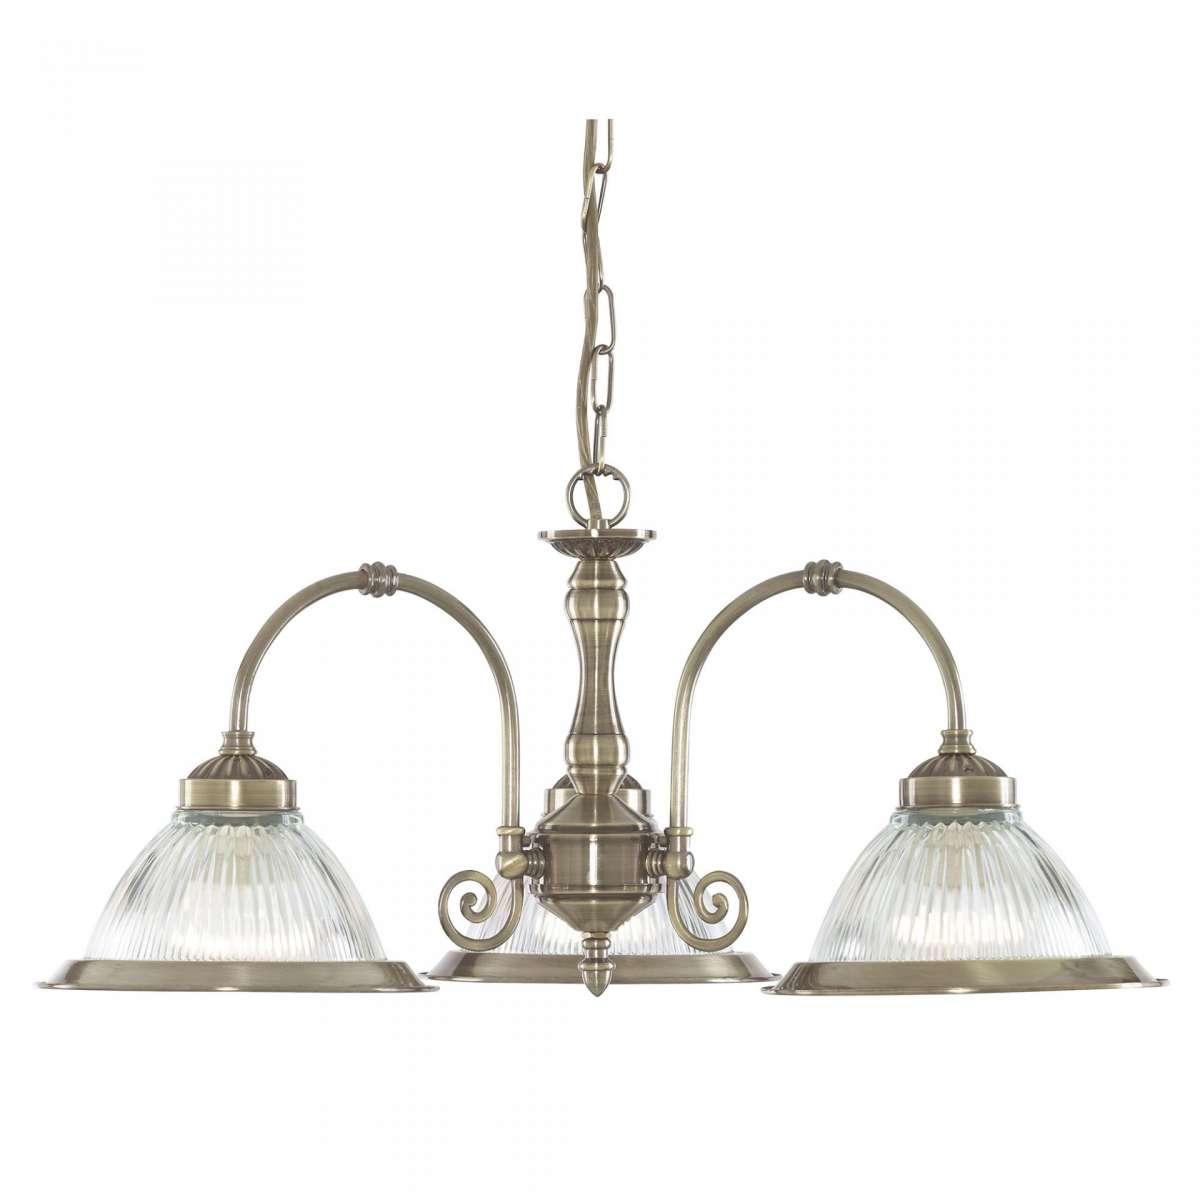 American Diner Antique Brass 3 Light OLS